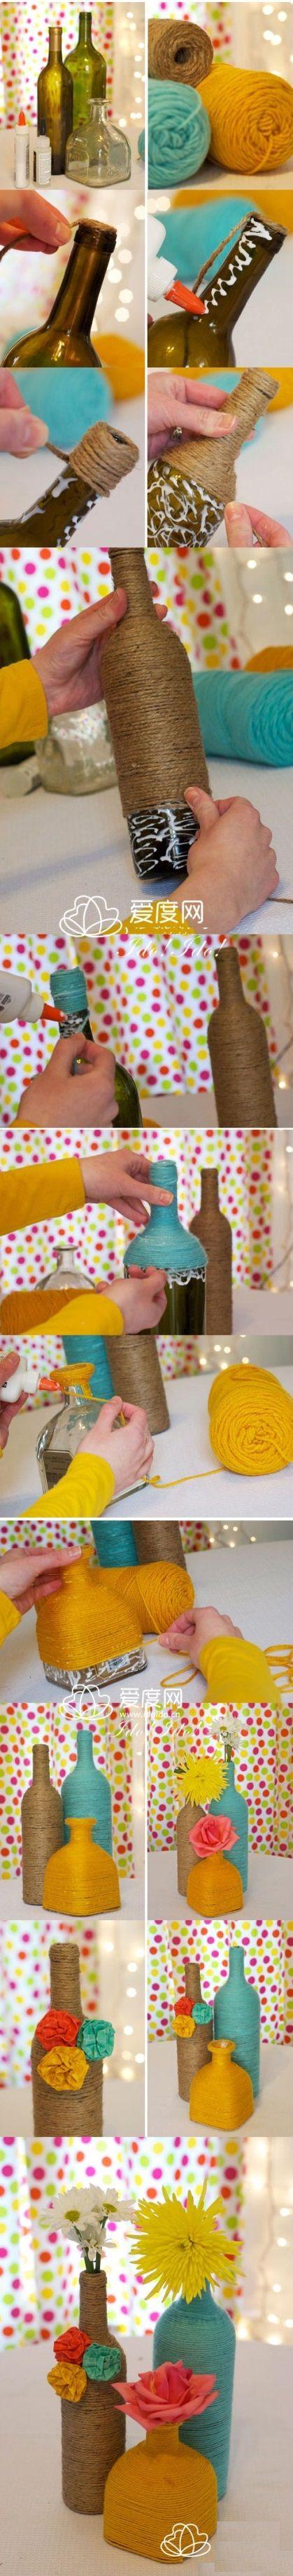 DIY Ideas: Beautiful Wrapped Bottles DIY